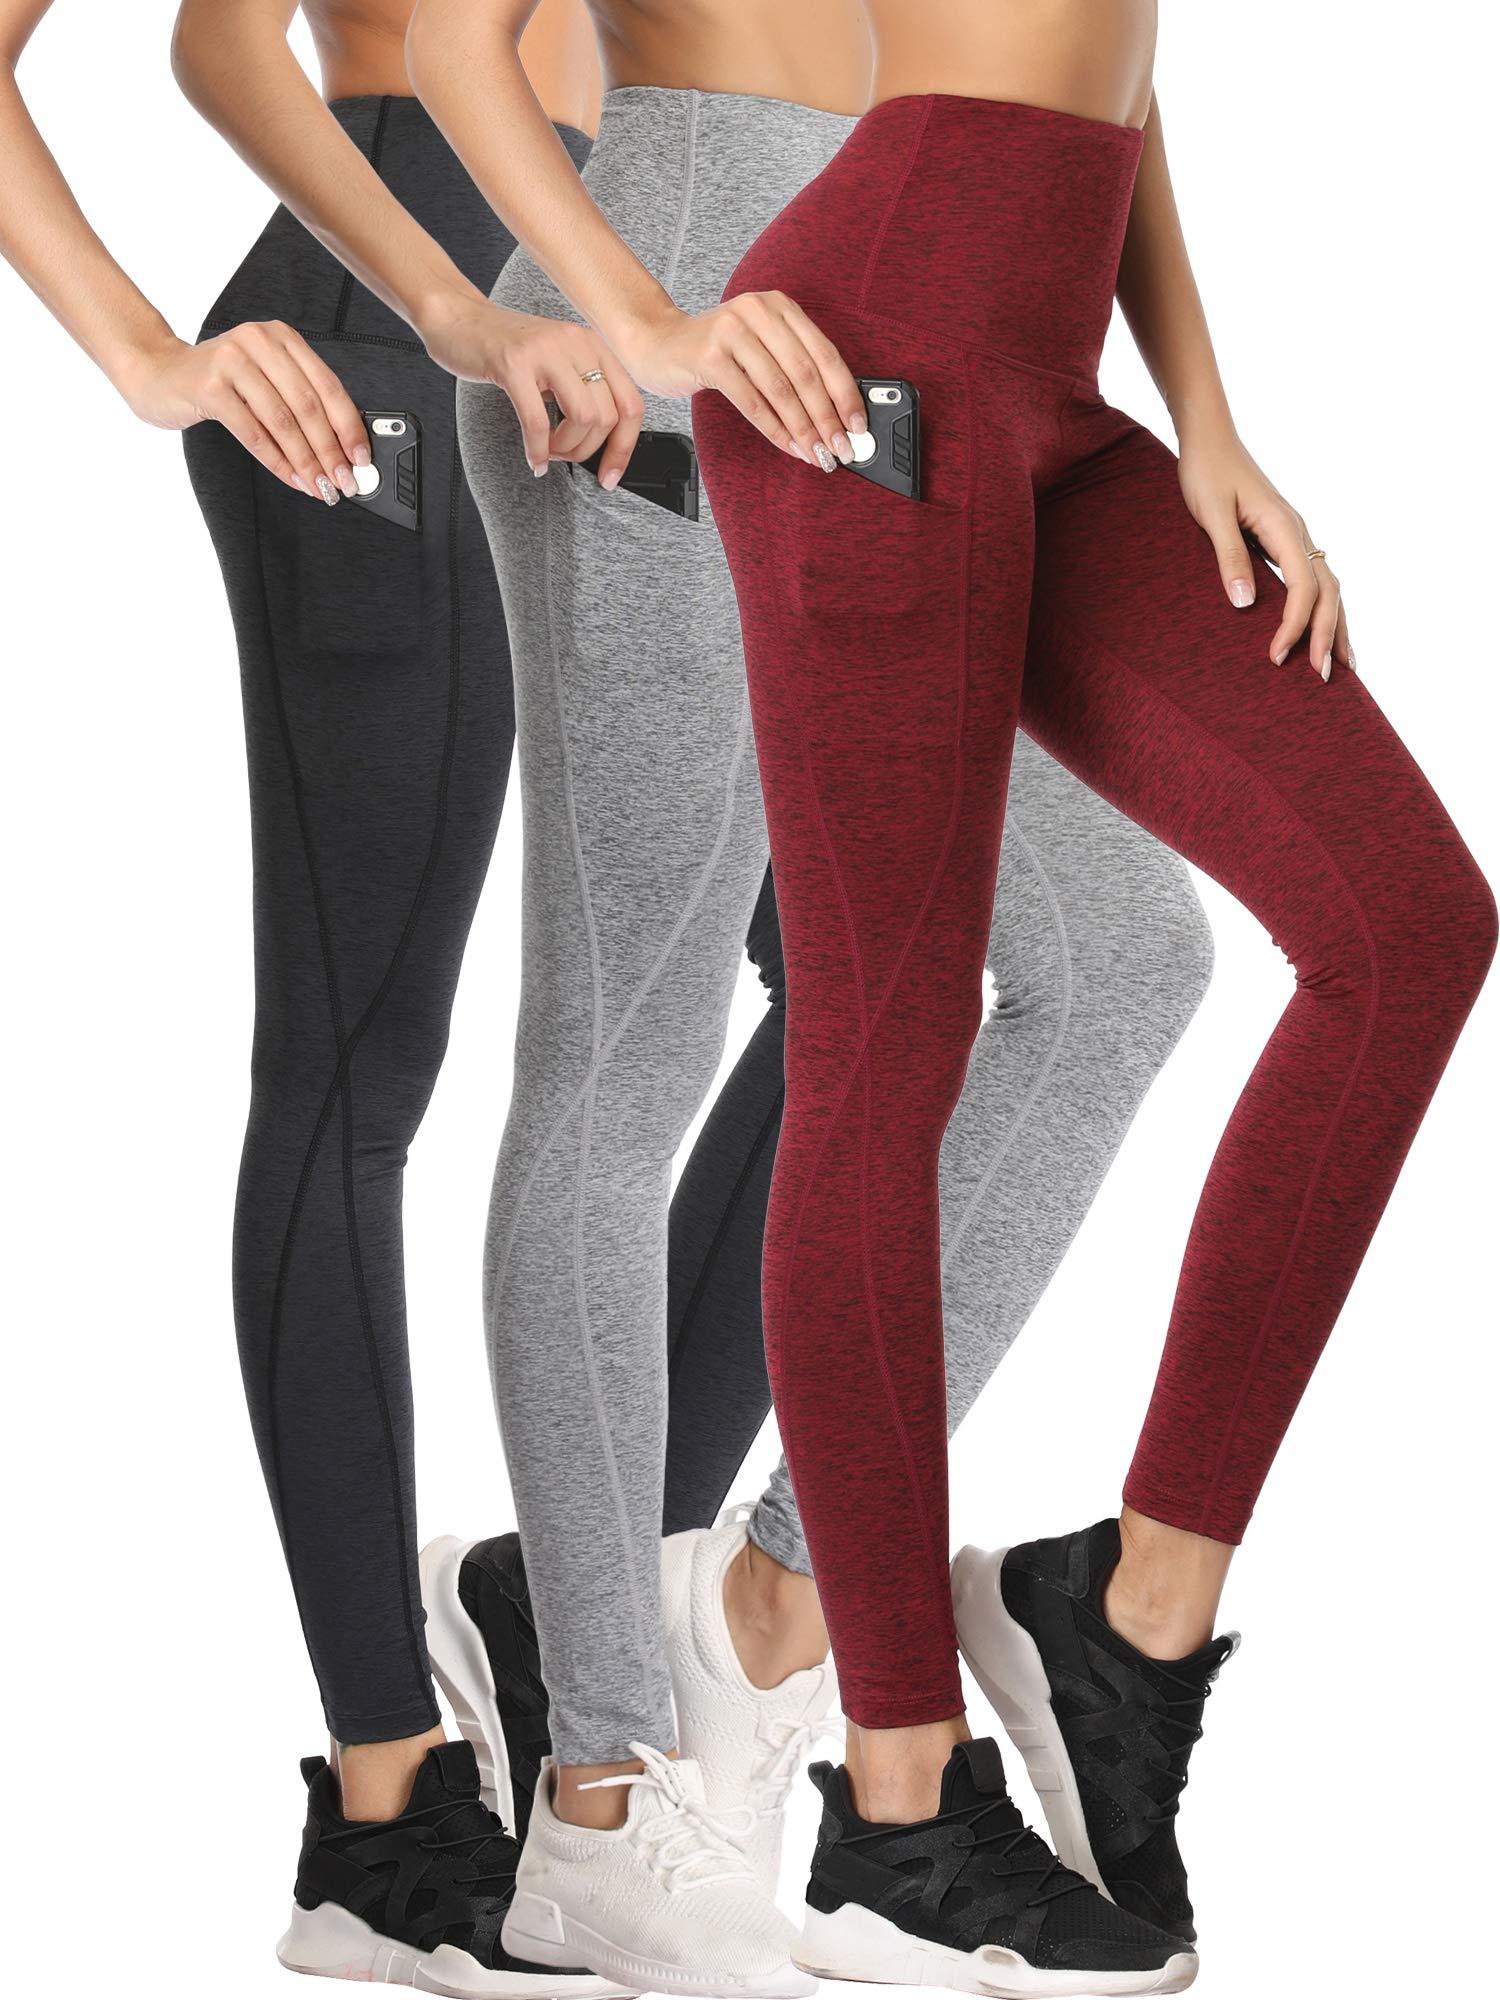 Neleus Women's 3 Pack Yoga Pants Tummy Control High Waist Workout Leggings,Dark Grey/Grey/Burgundy Red,M by Neleus